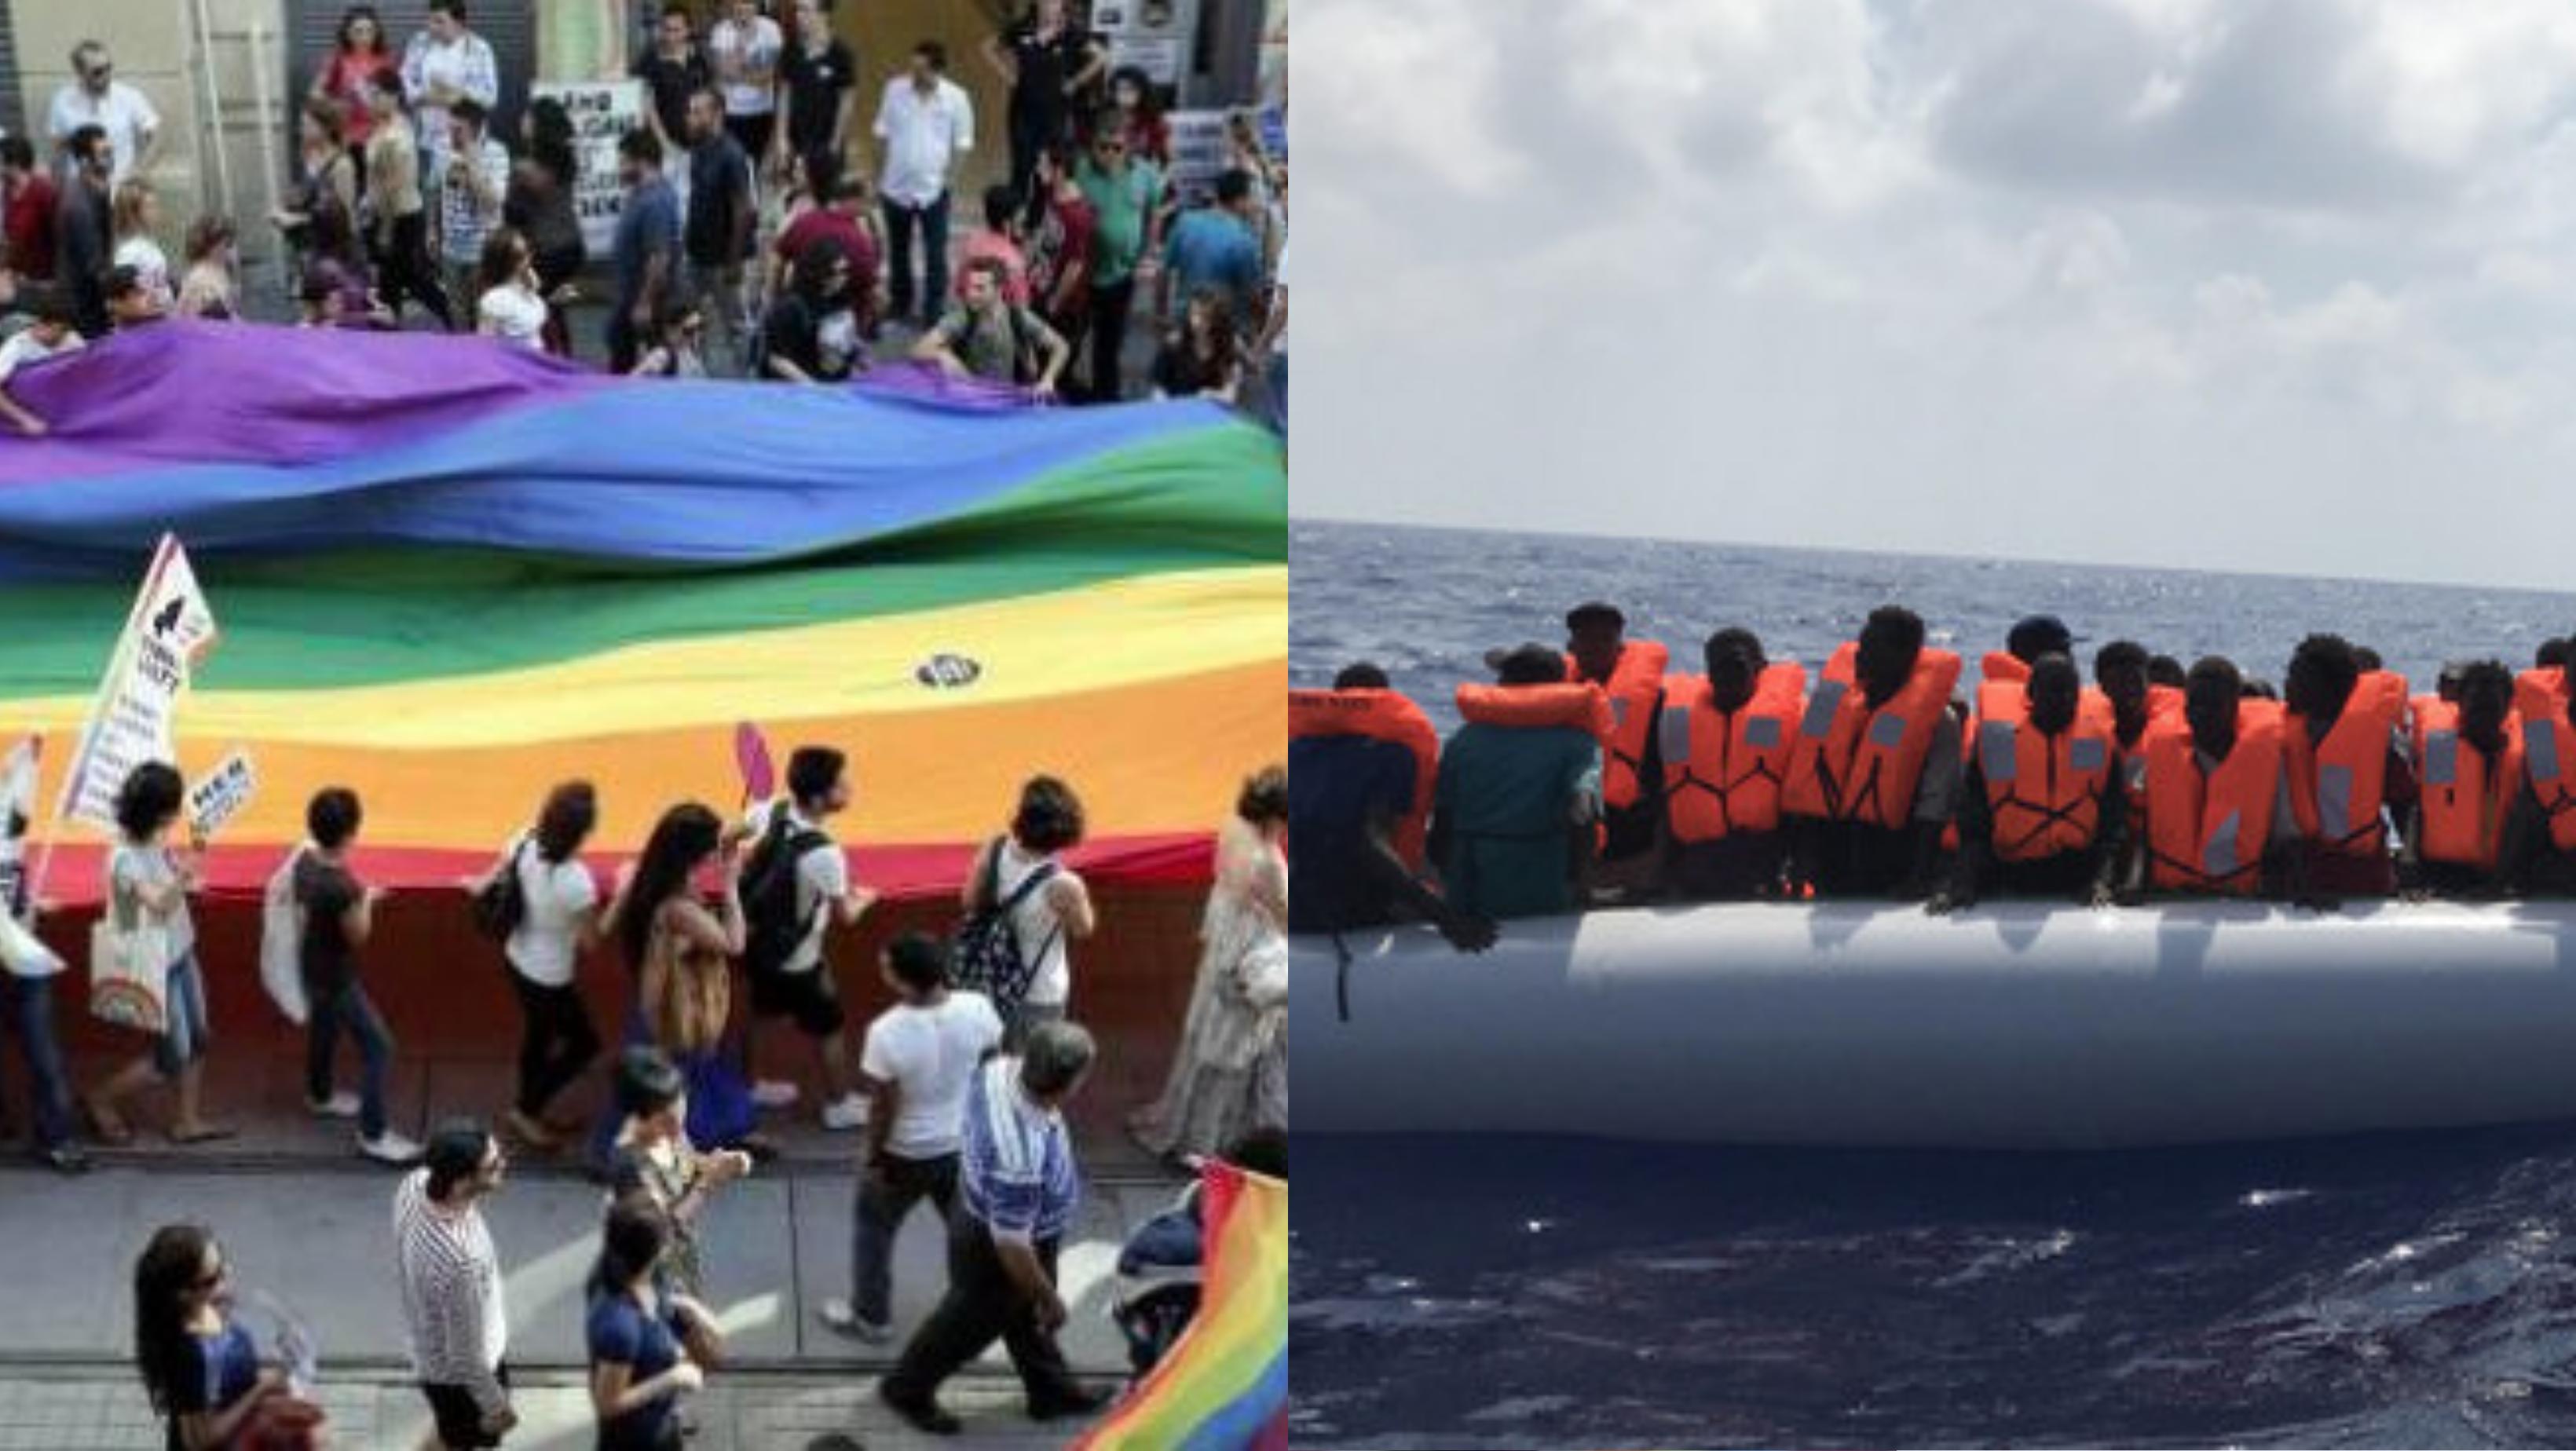 omosessuali e migranti